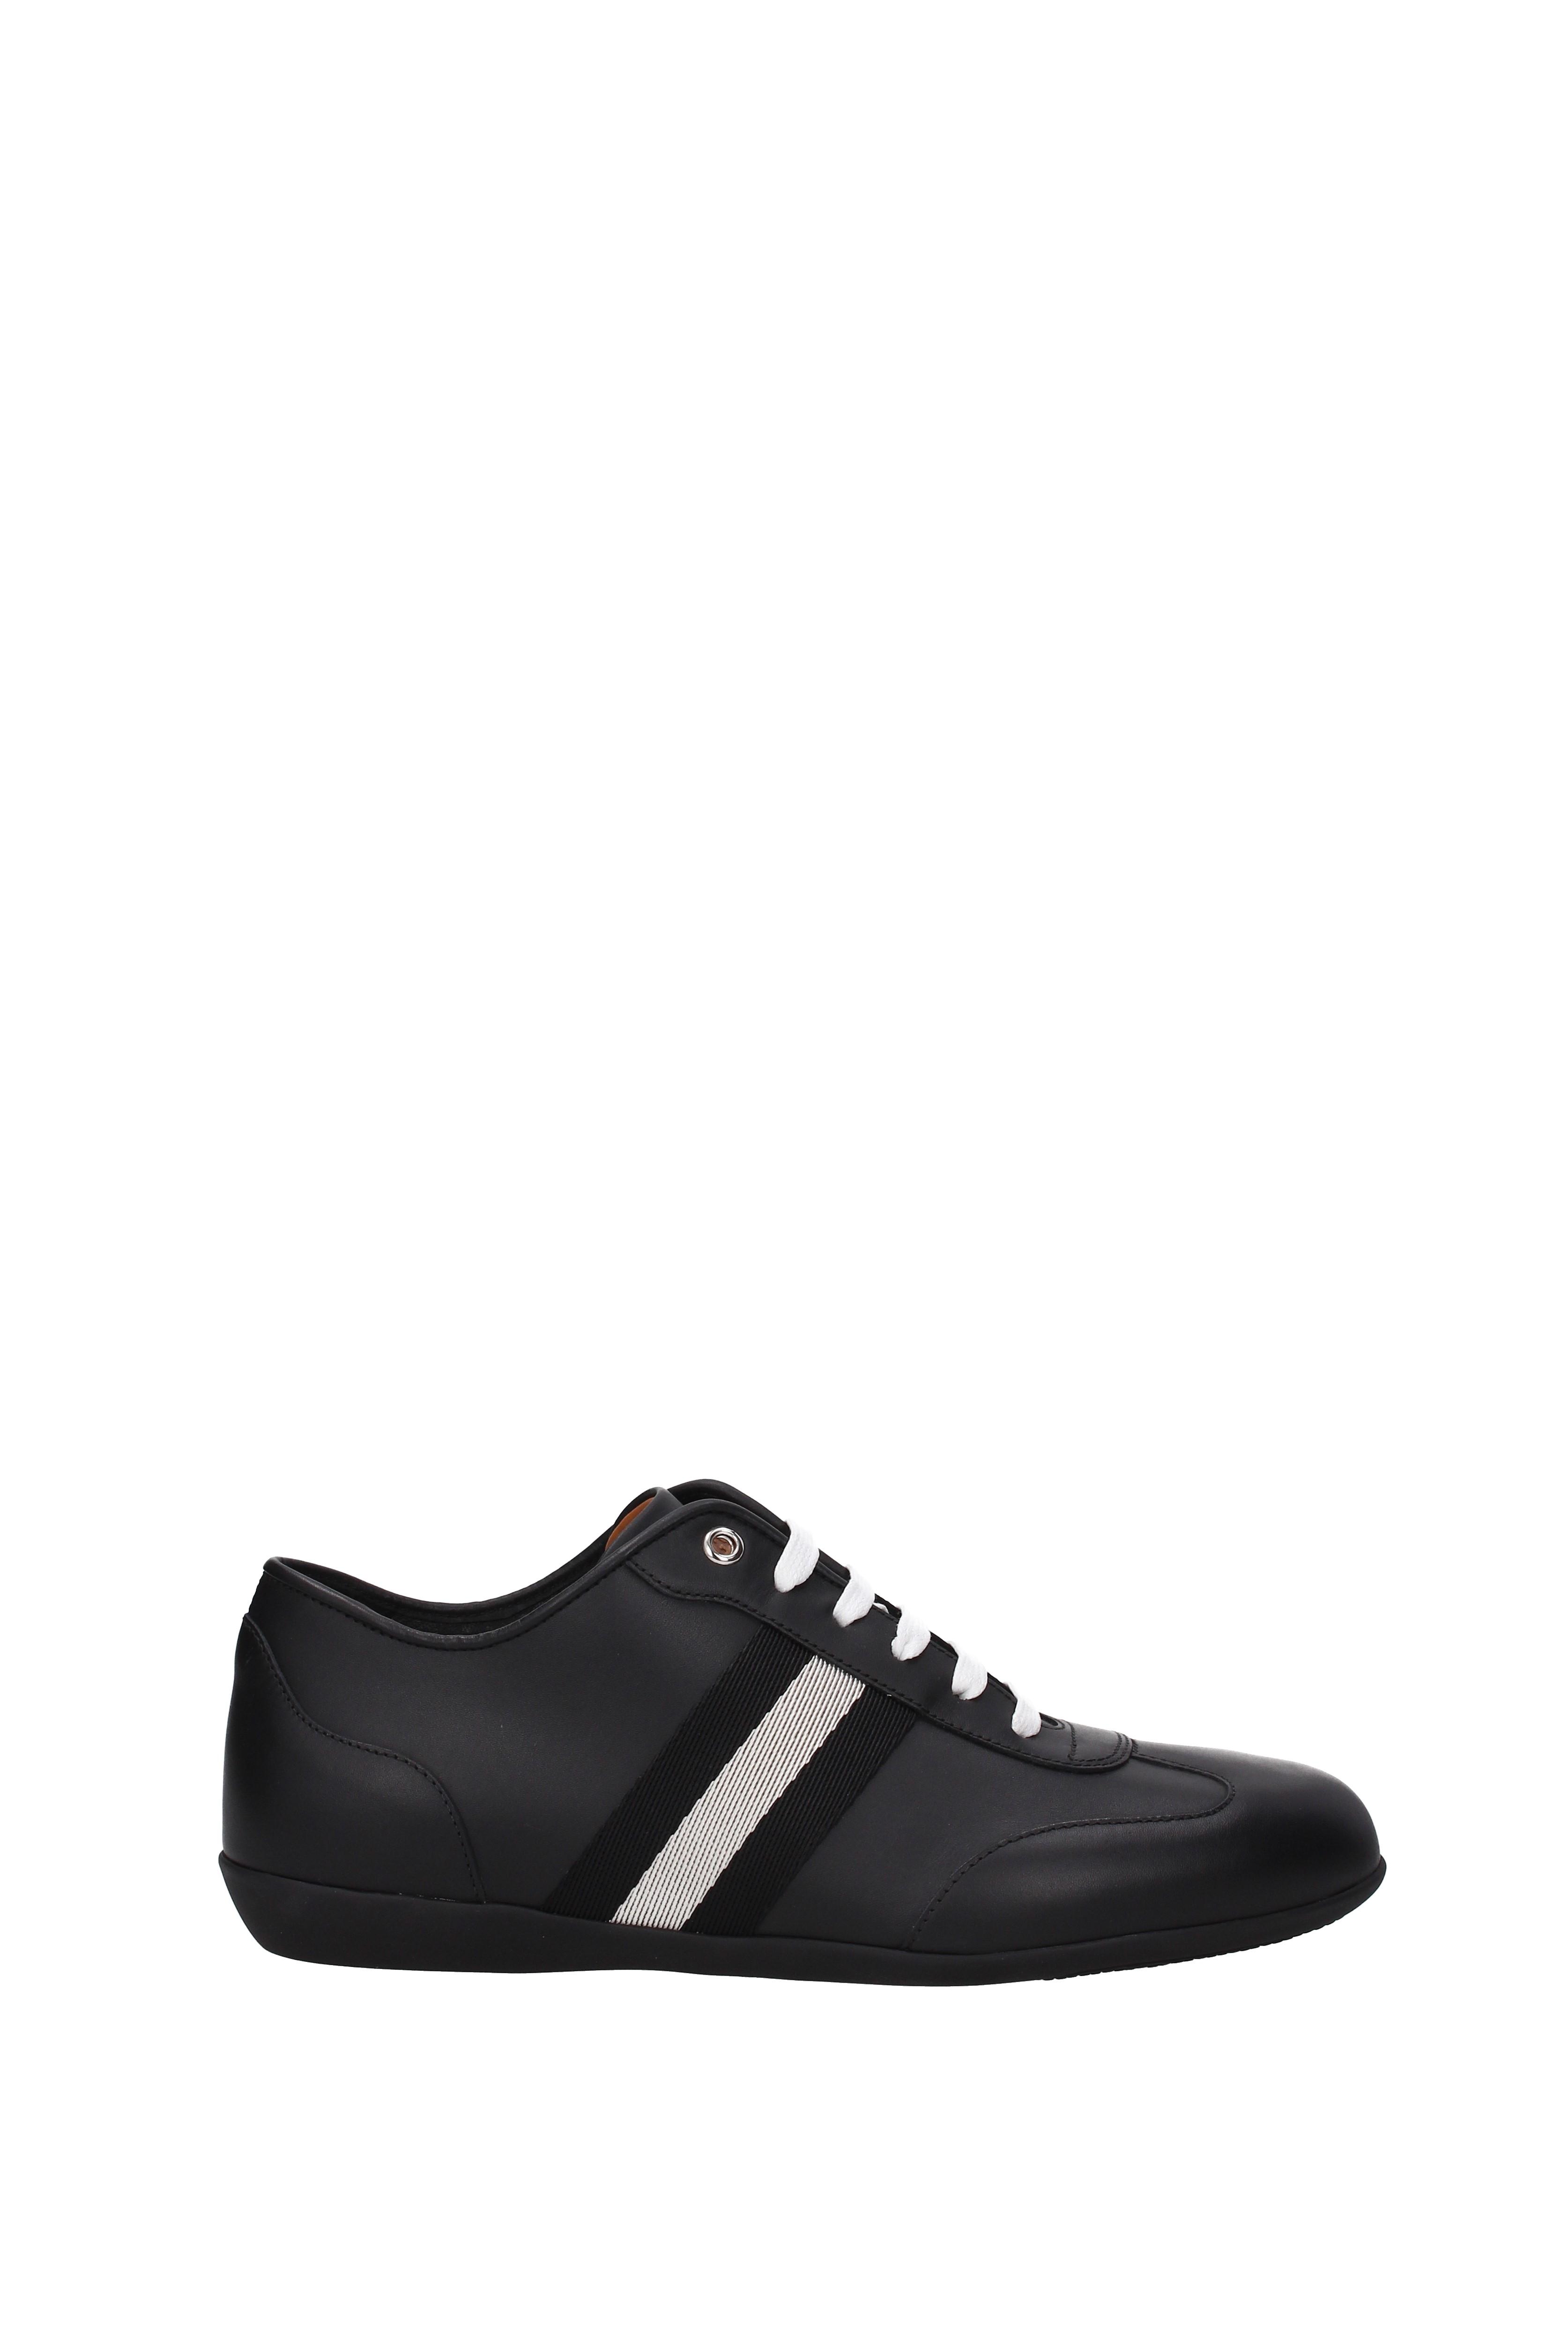 Sneakers Bally Bally Sneakers harlam Herren - Leder (HARLAM62174) 04749d